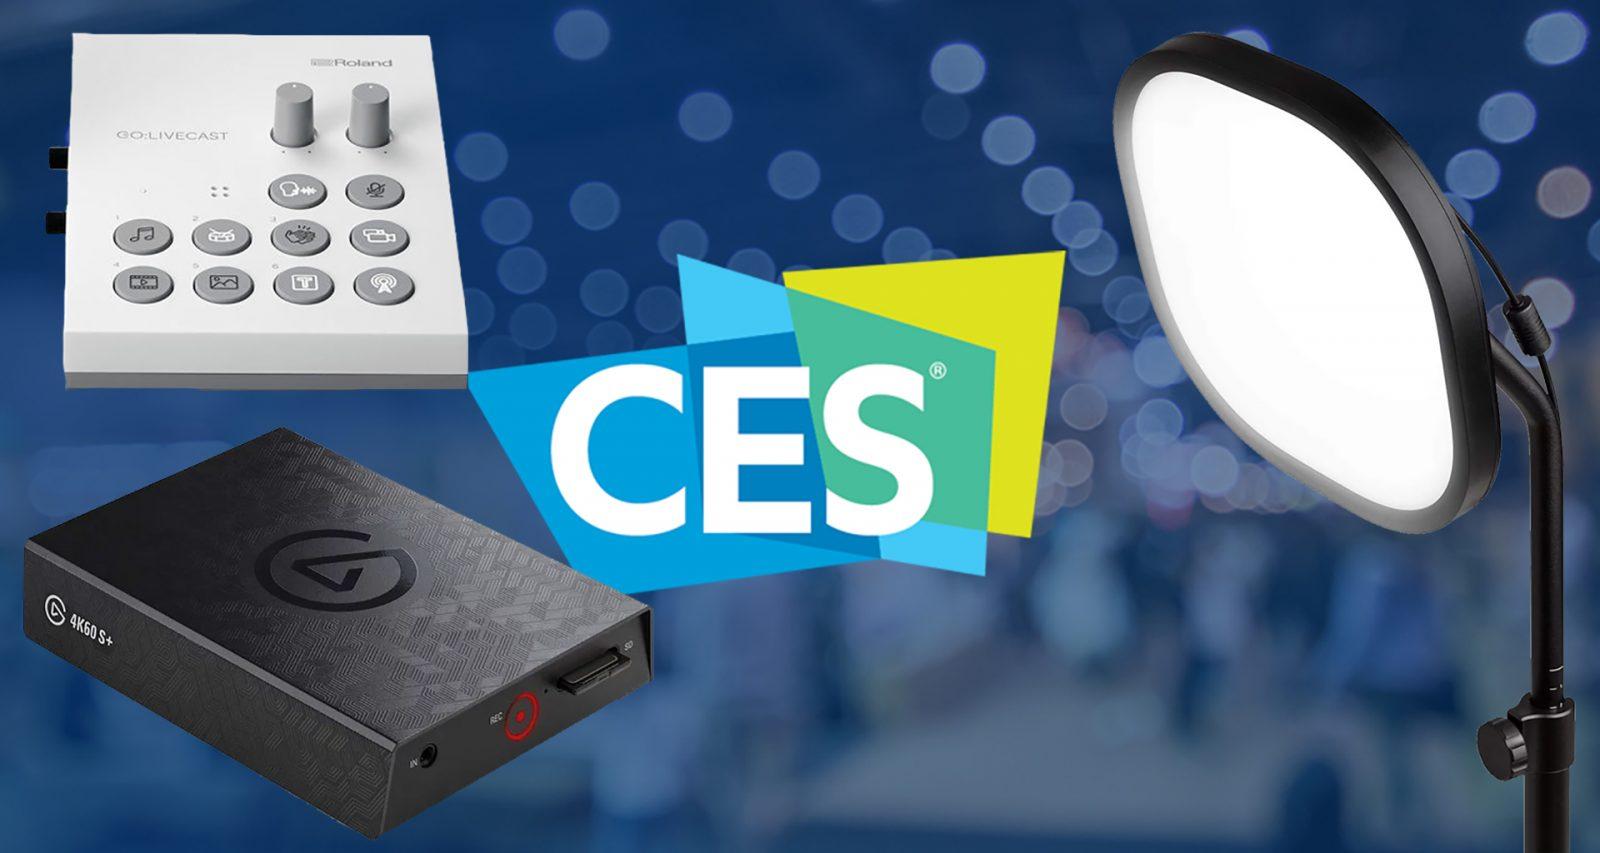 CES 2020 Streamer Gear Announcements